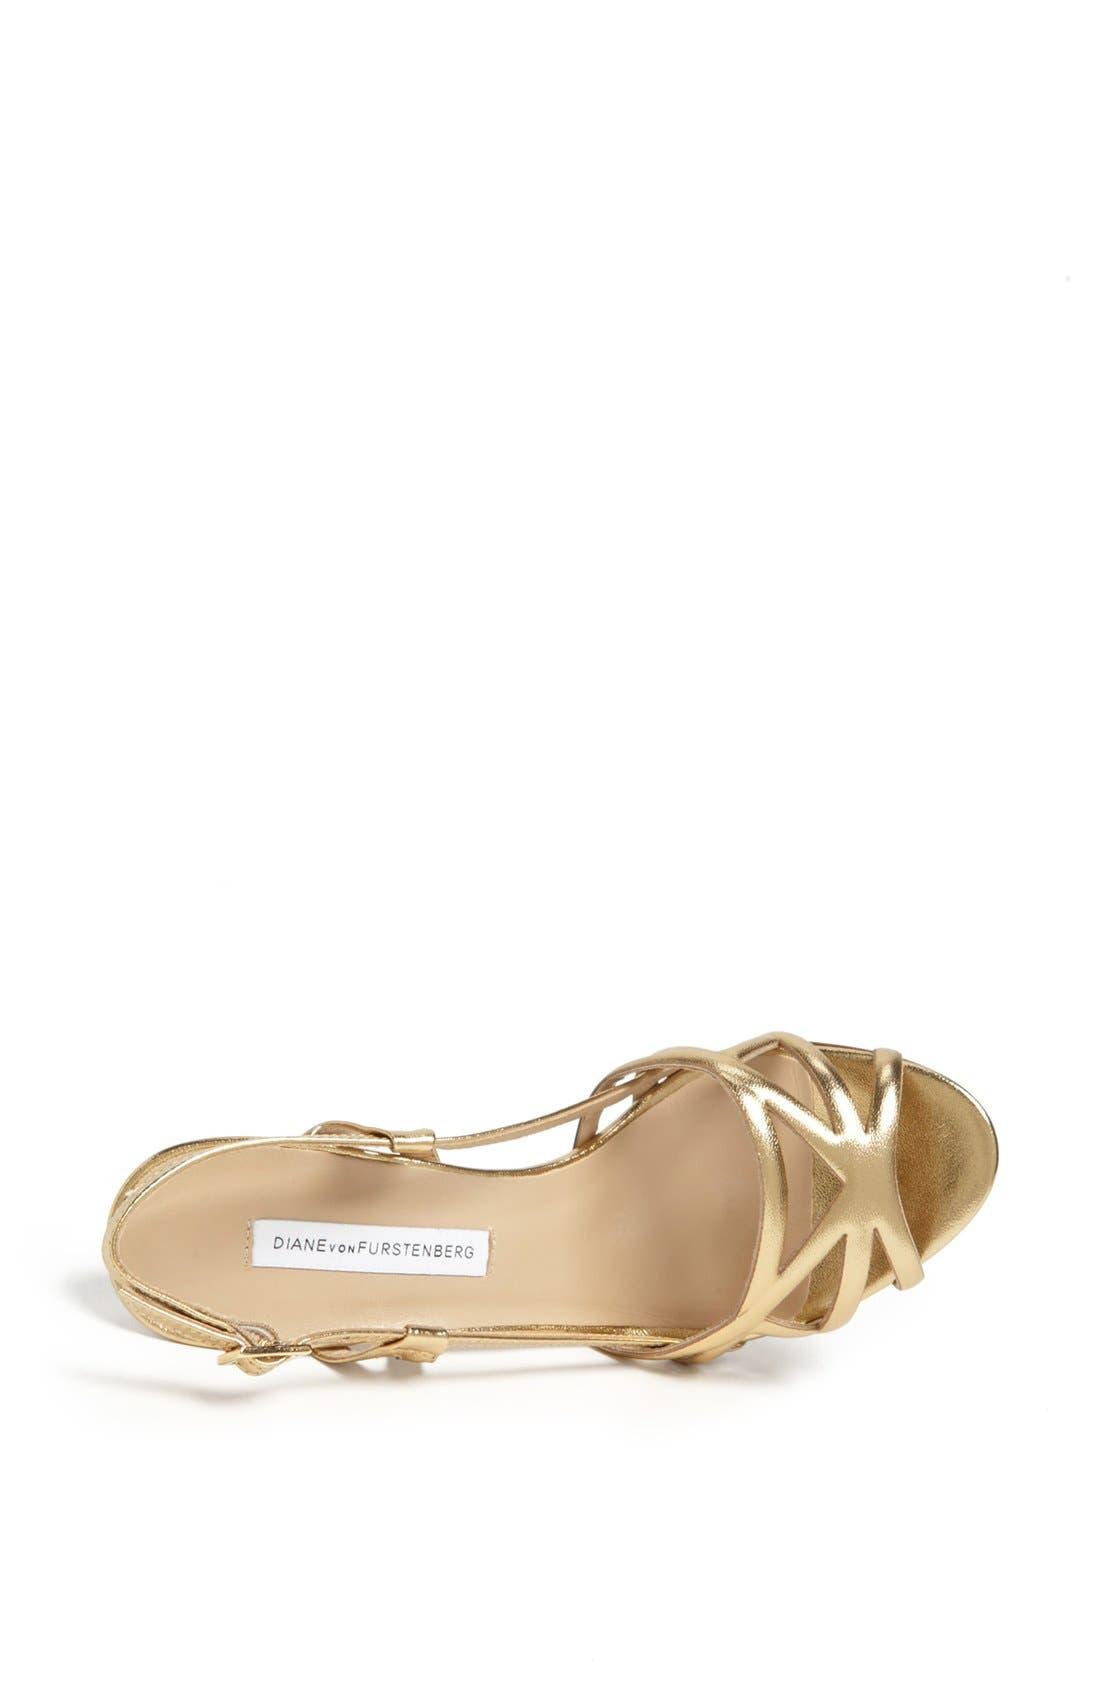 Alternate Image 3  - Diane von Furstenberg 'Upton' Metallic Leather Sandal